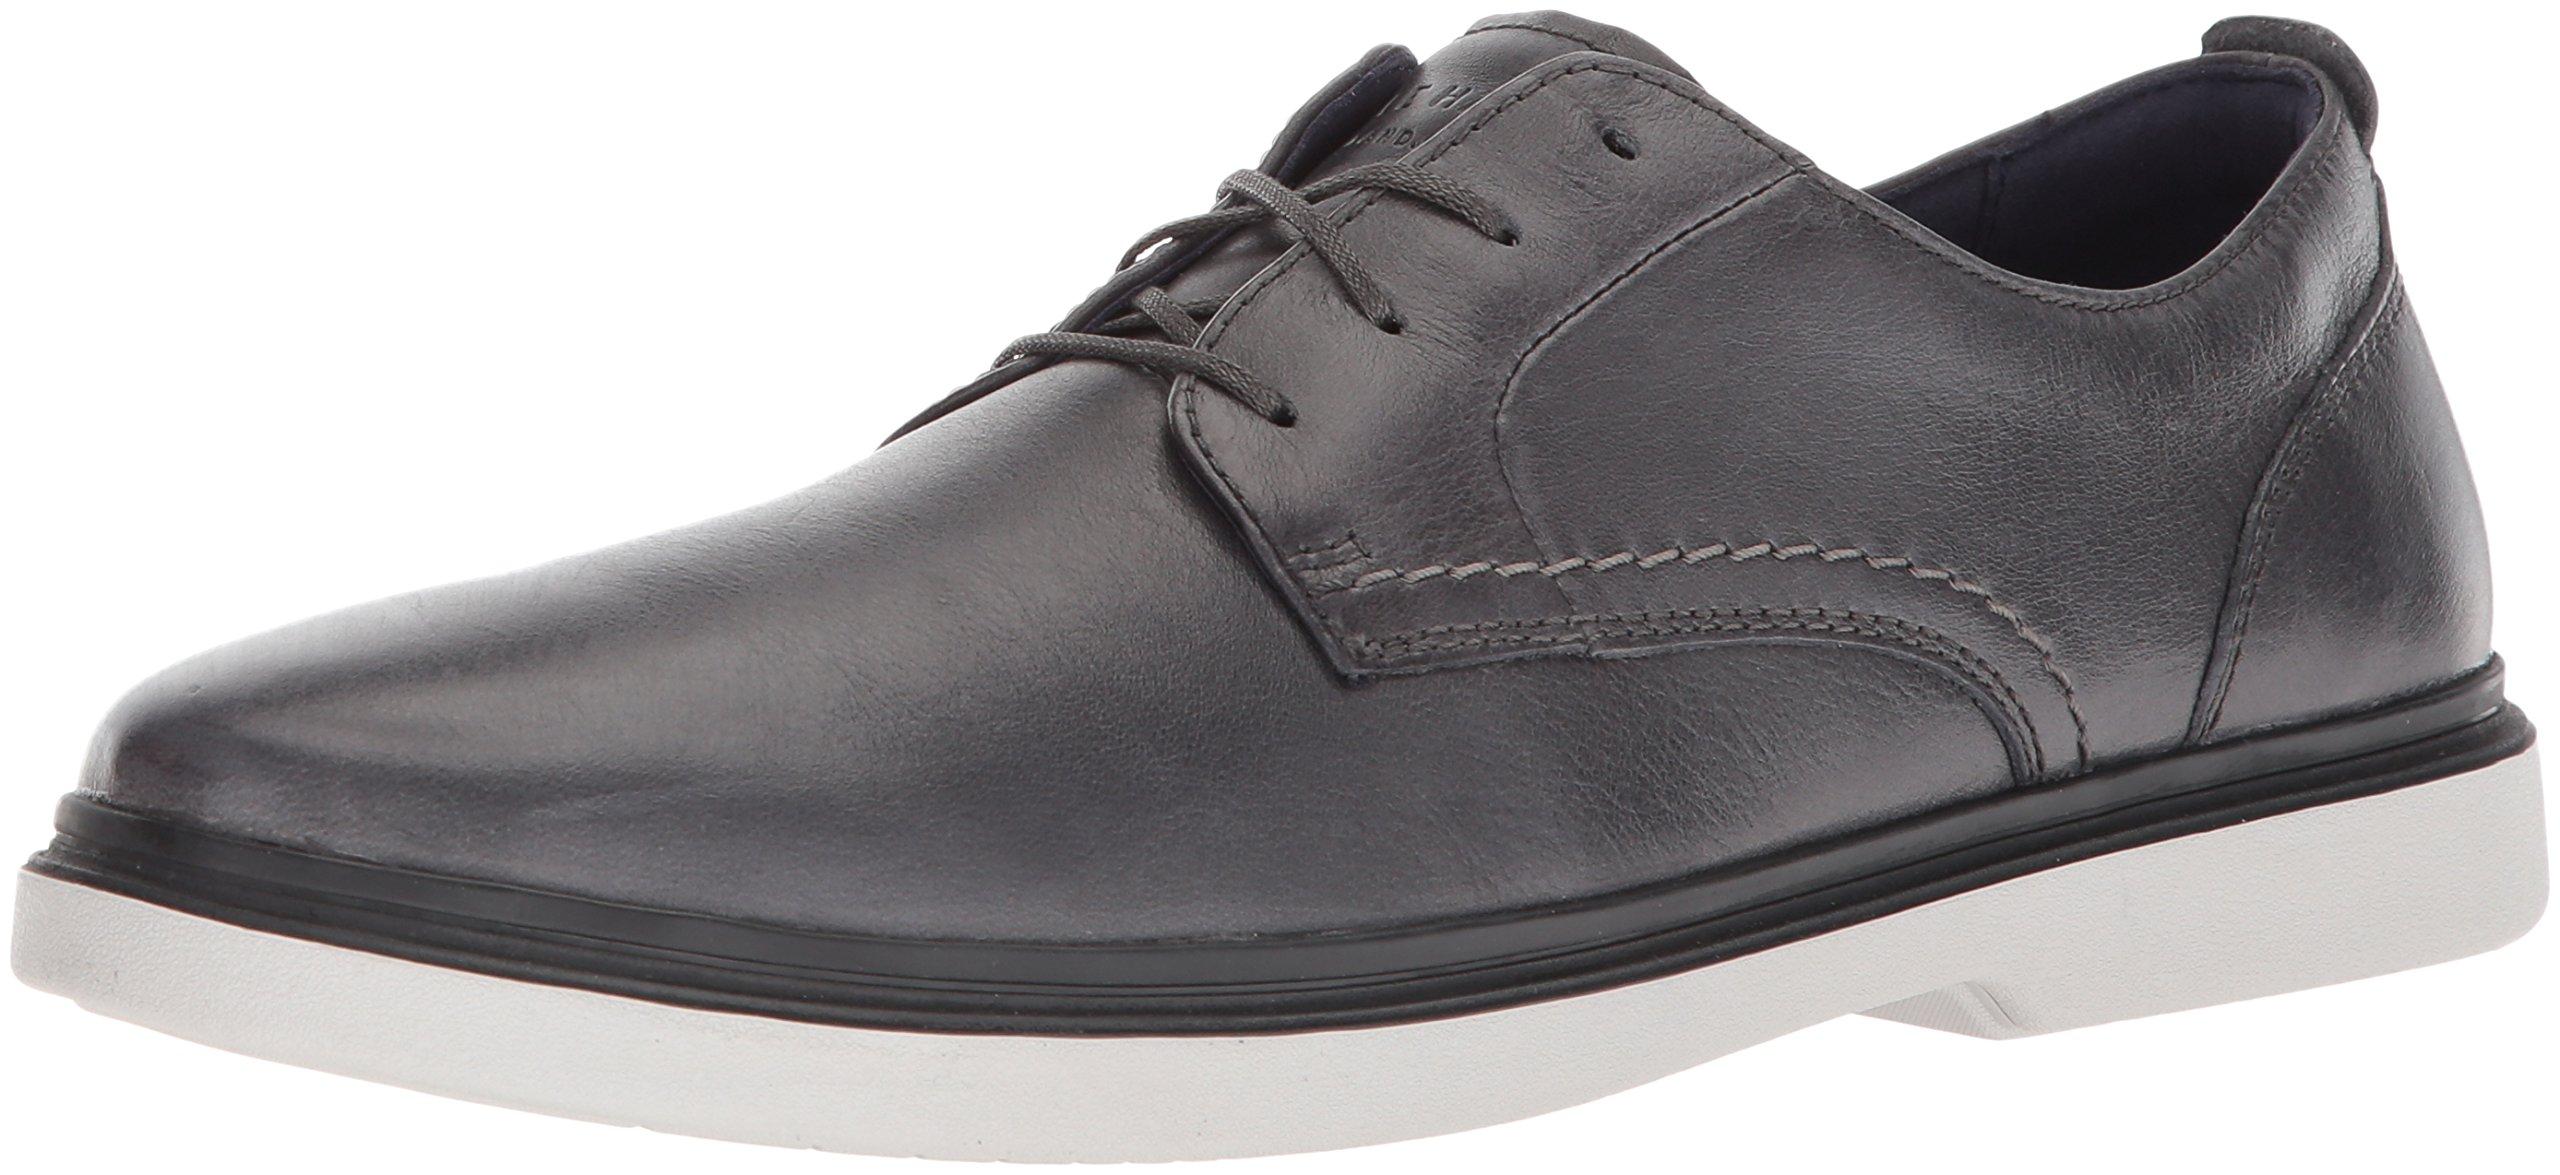 Cole Haan Men's Brandt Plain Toe Oxford, Magnet/Vapor Grey, 10.5 Medium US